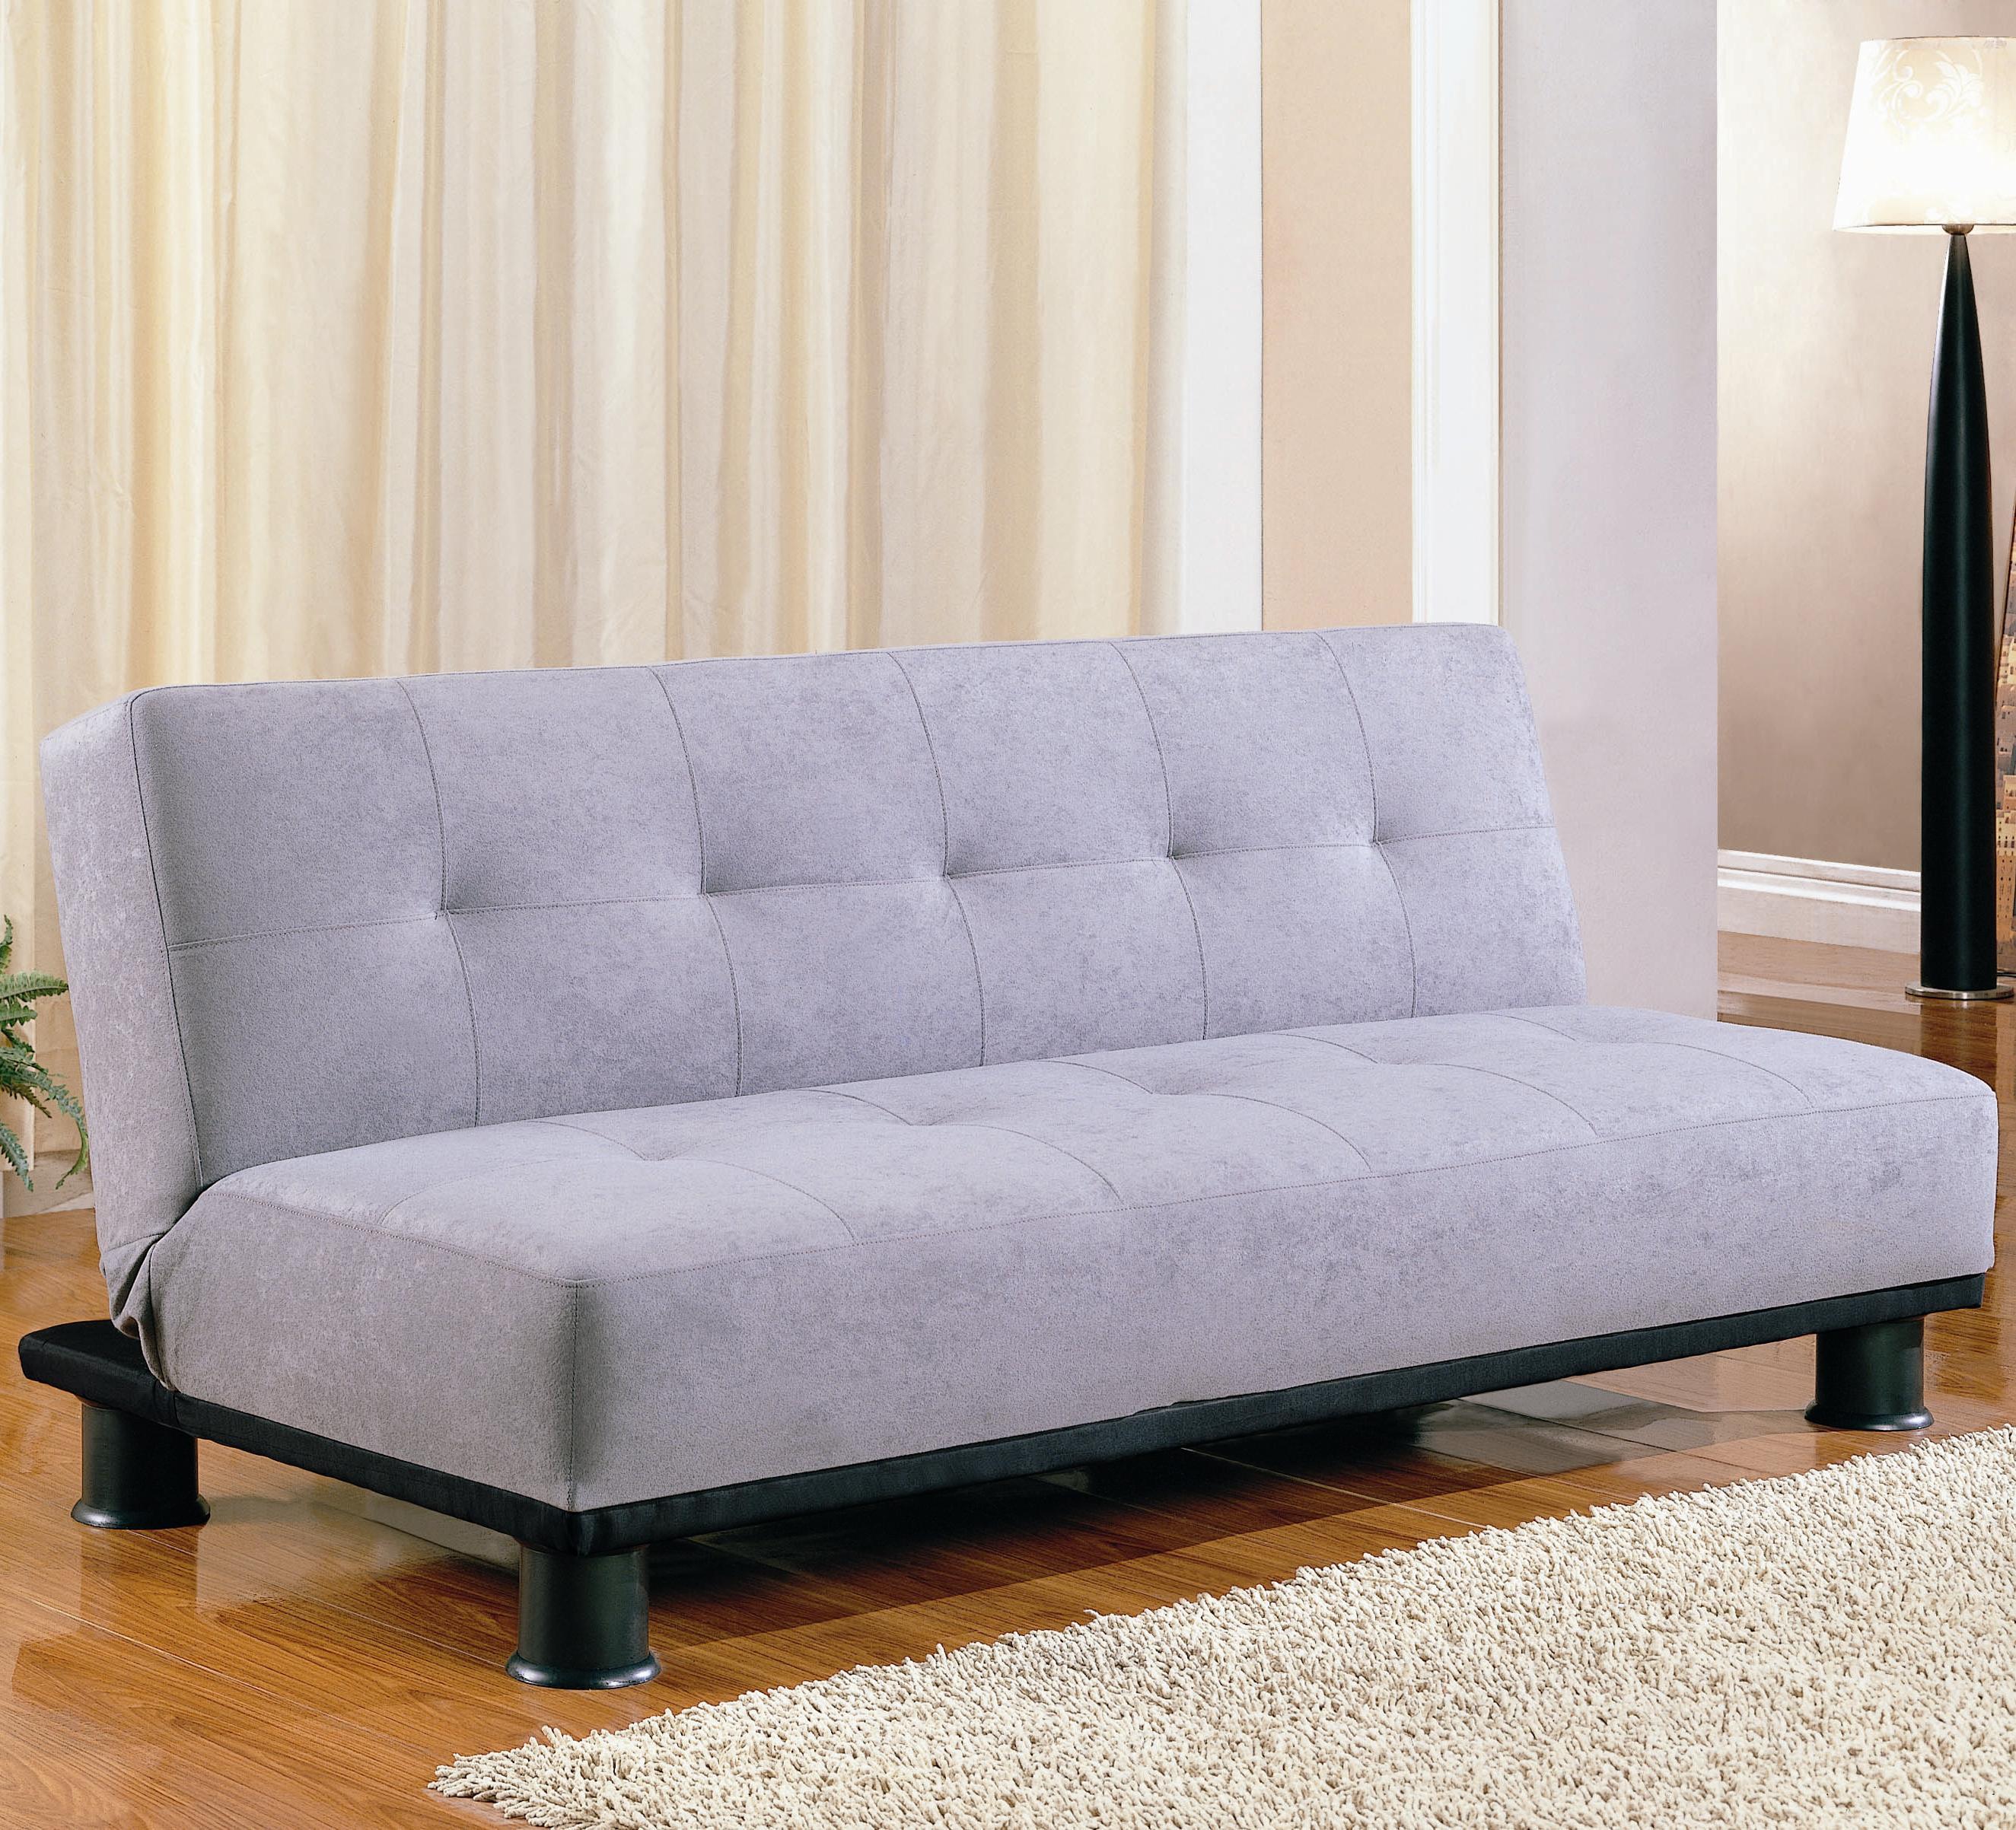 queen sofa bed no arms modern modular sofas uk armless futon sleeper by coaster sleepworks